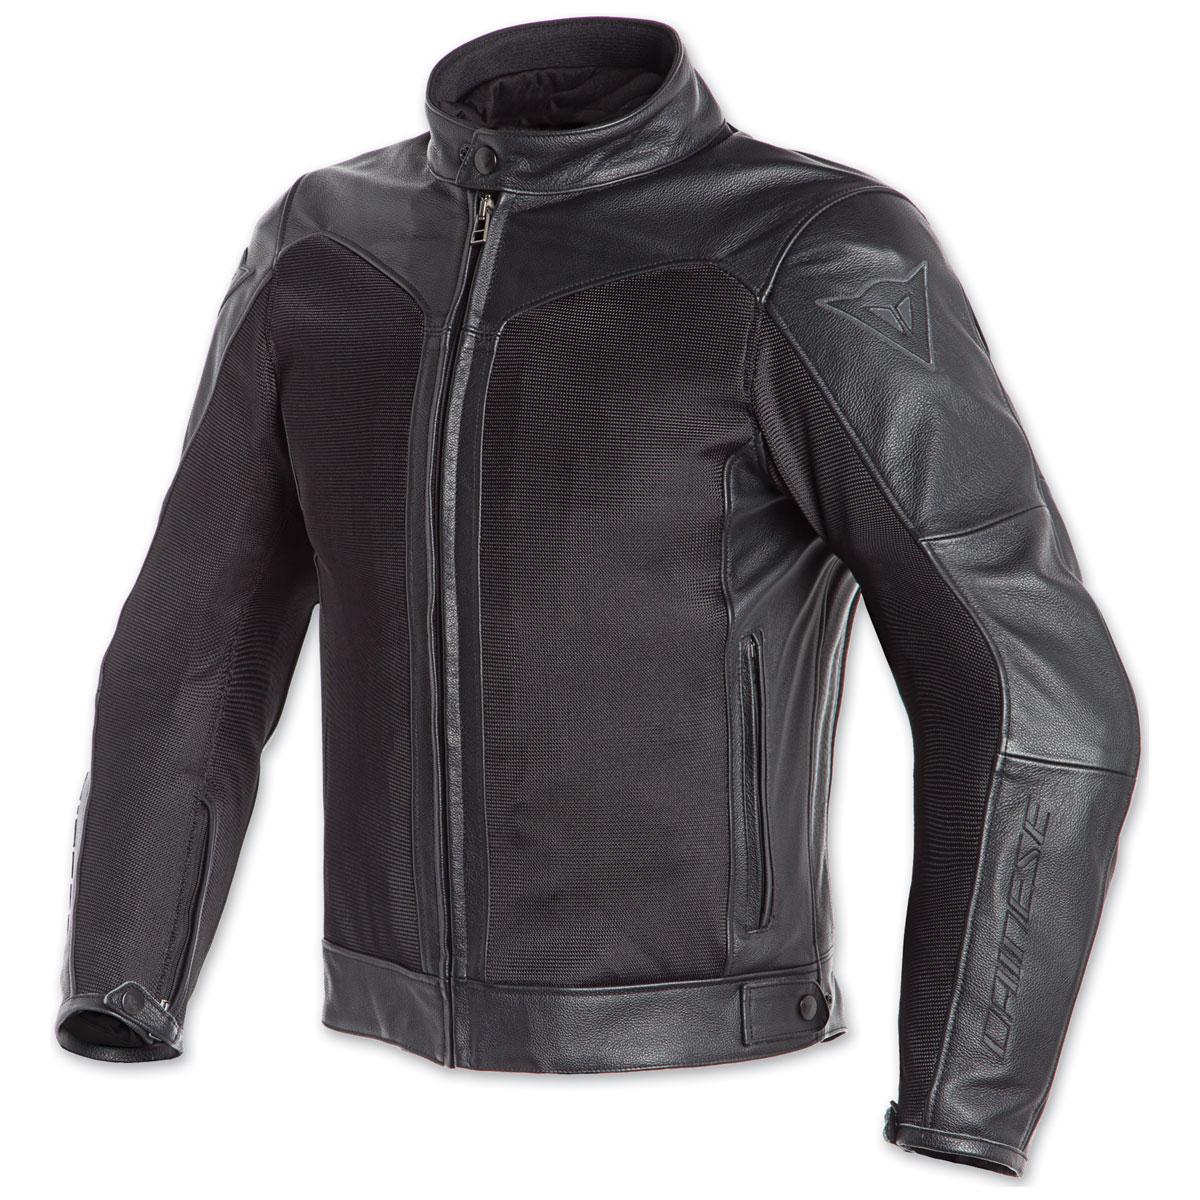 Dainese Men's Corbin D-Dry Black Leather Jacket